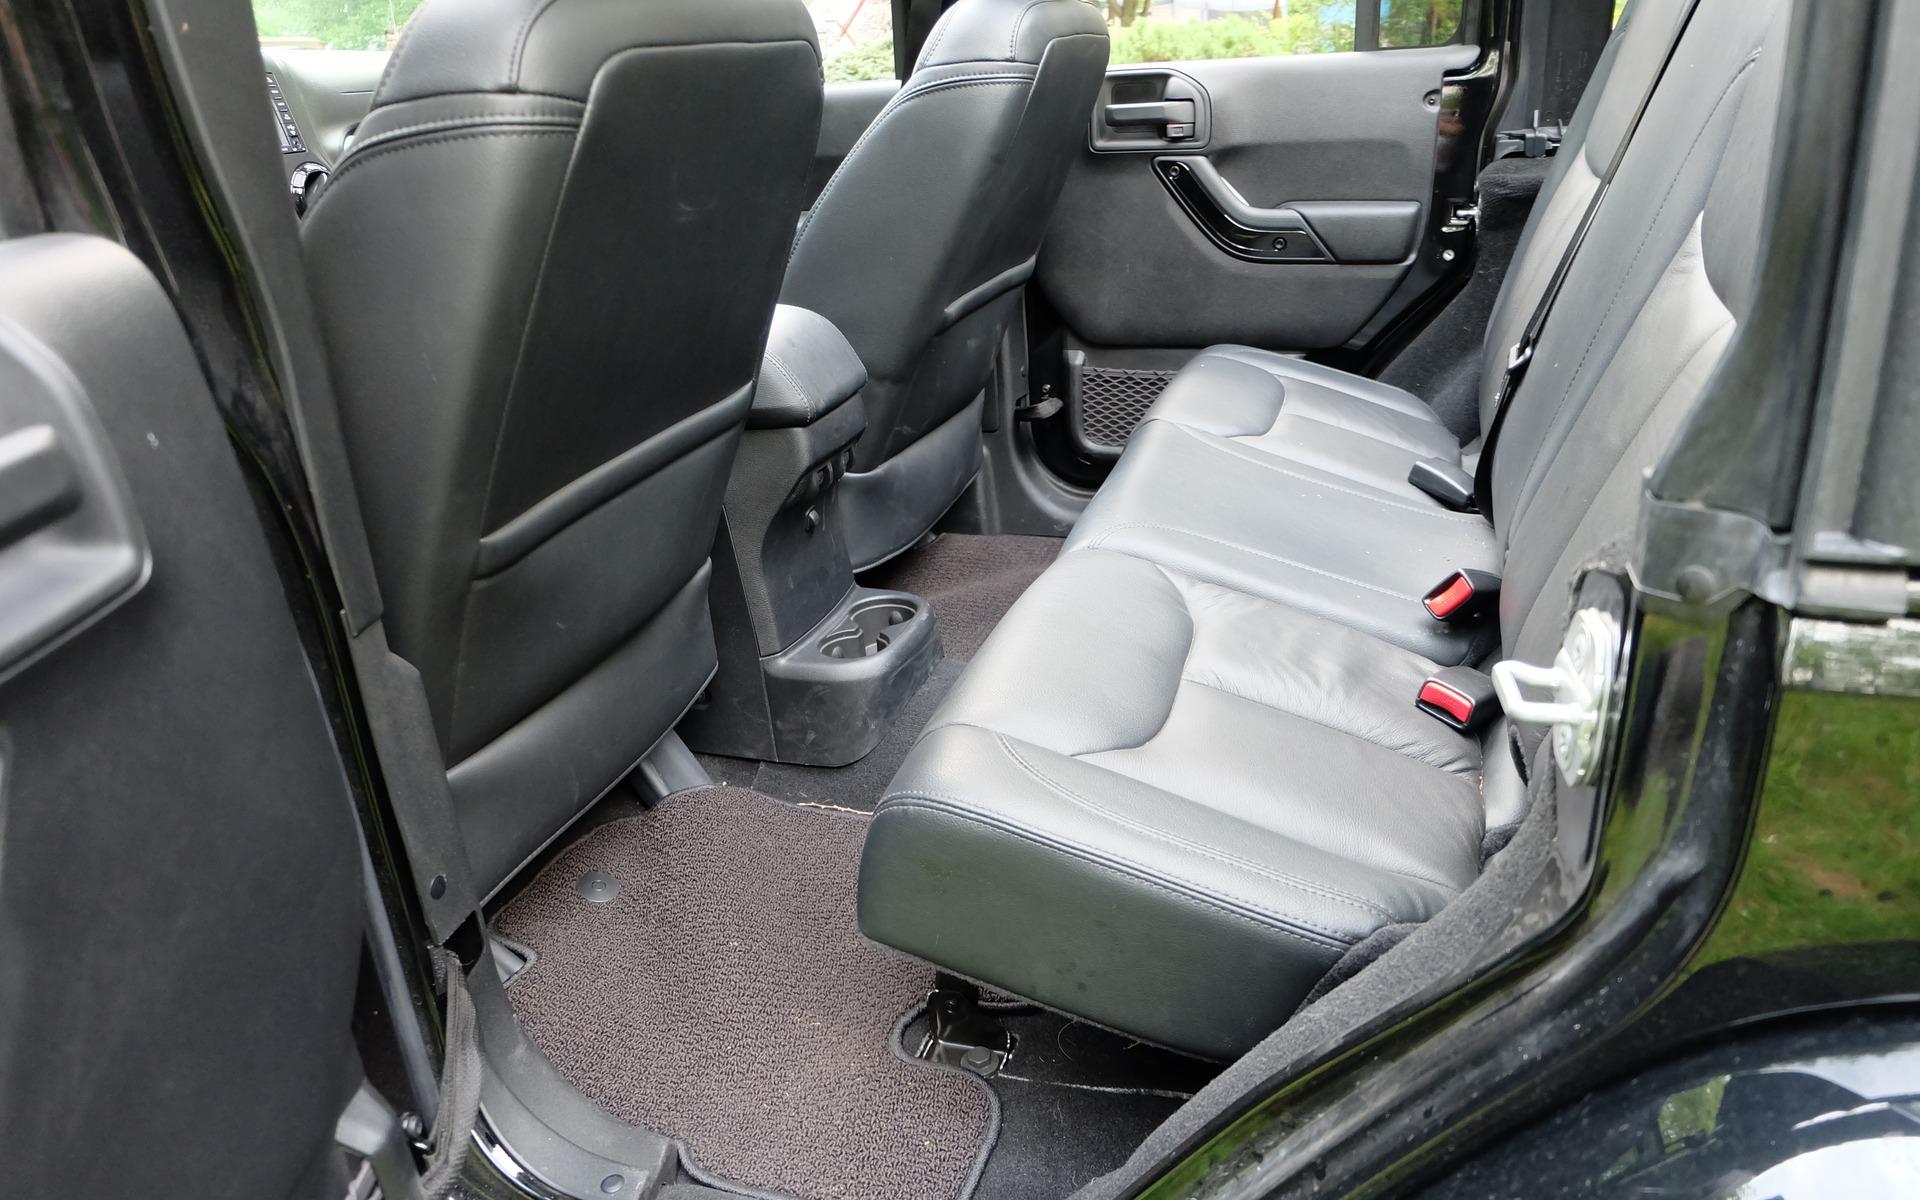 une histoire de jeep yj vs jk vs yj 5 21. Black Bedroom Furniture Sets. Home Design Ideas